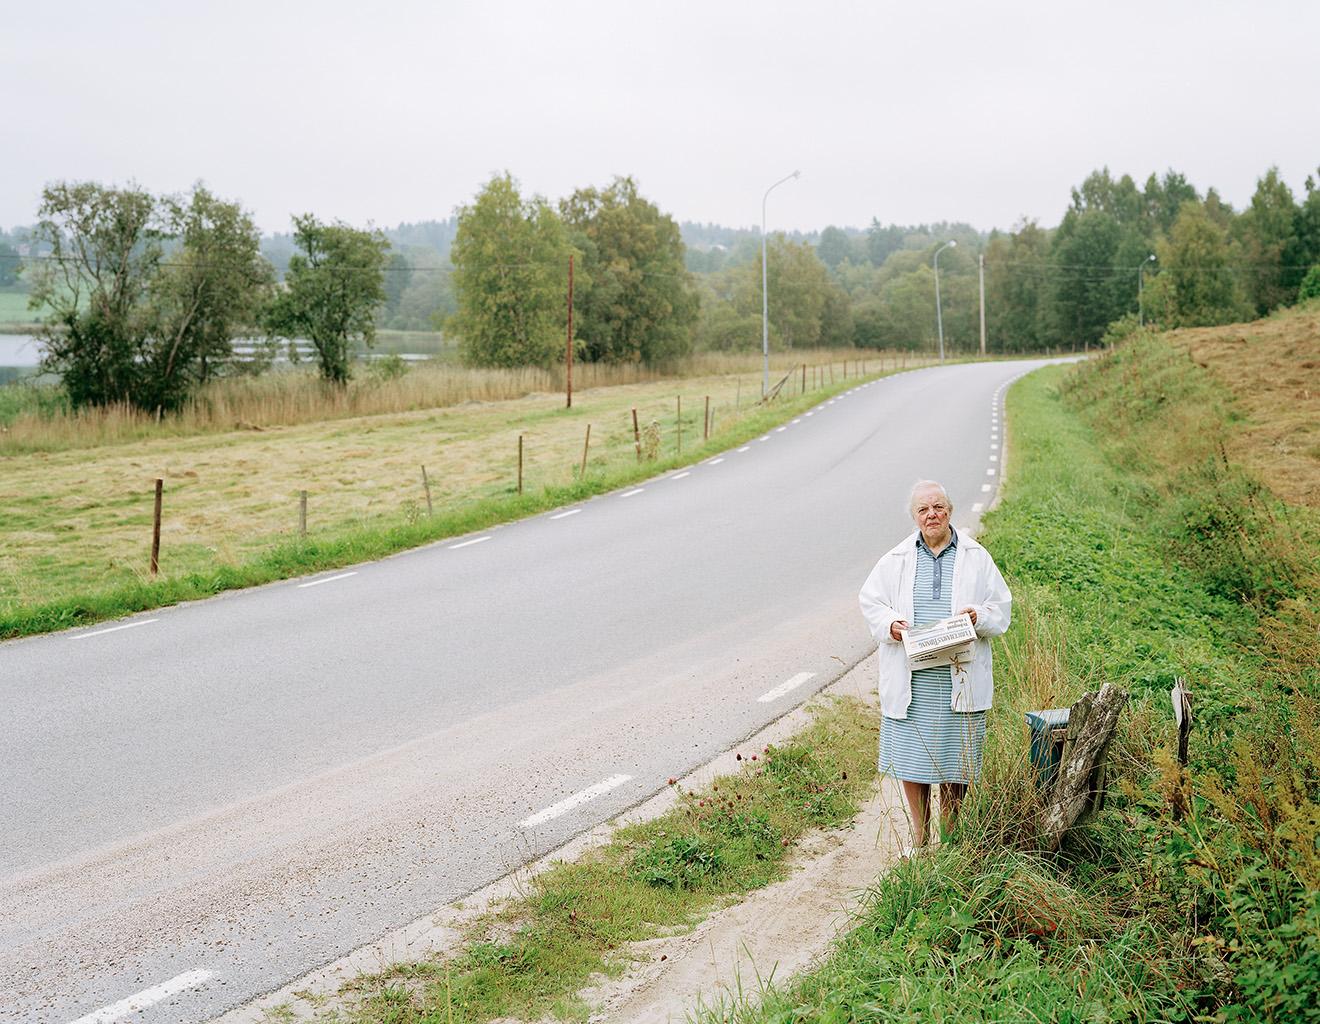 Inga-Brita at the mailbox, Alarp, 6 September 2004